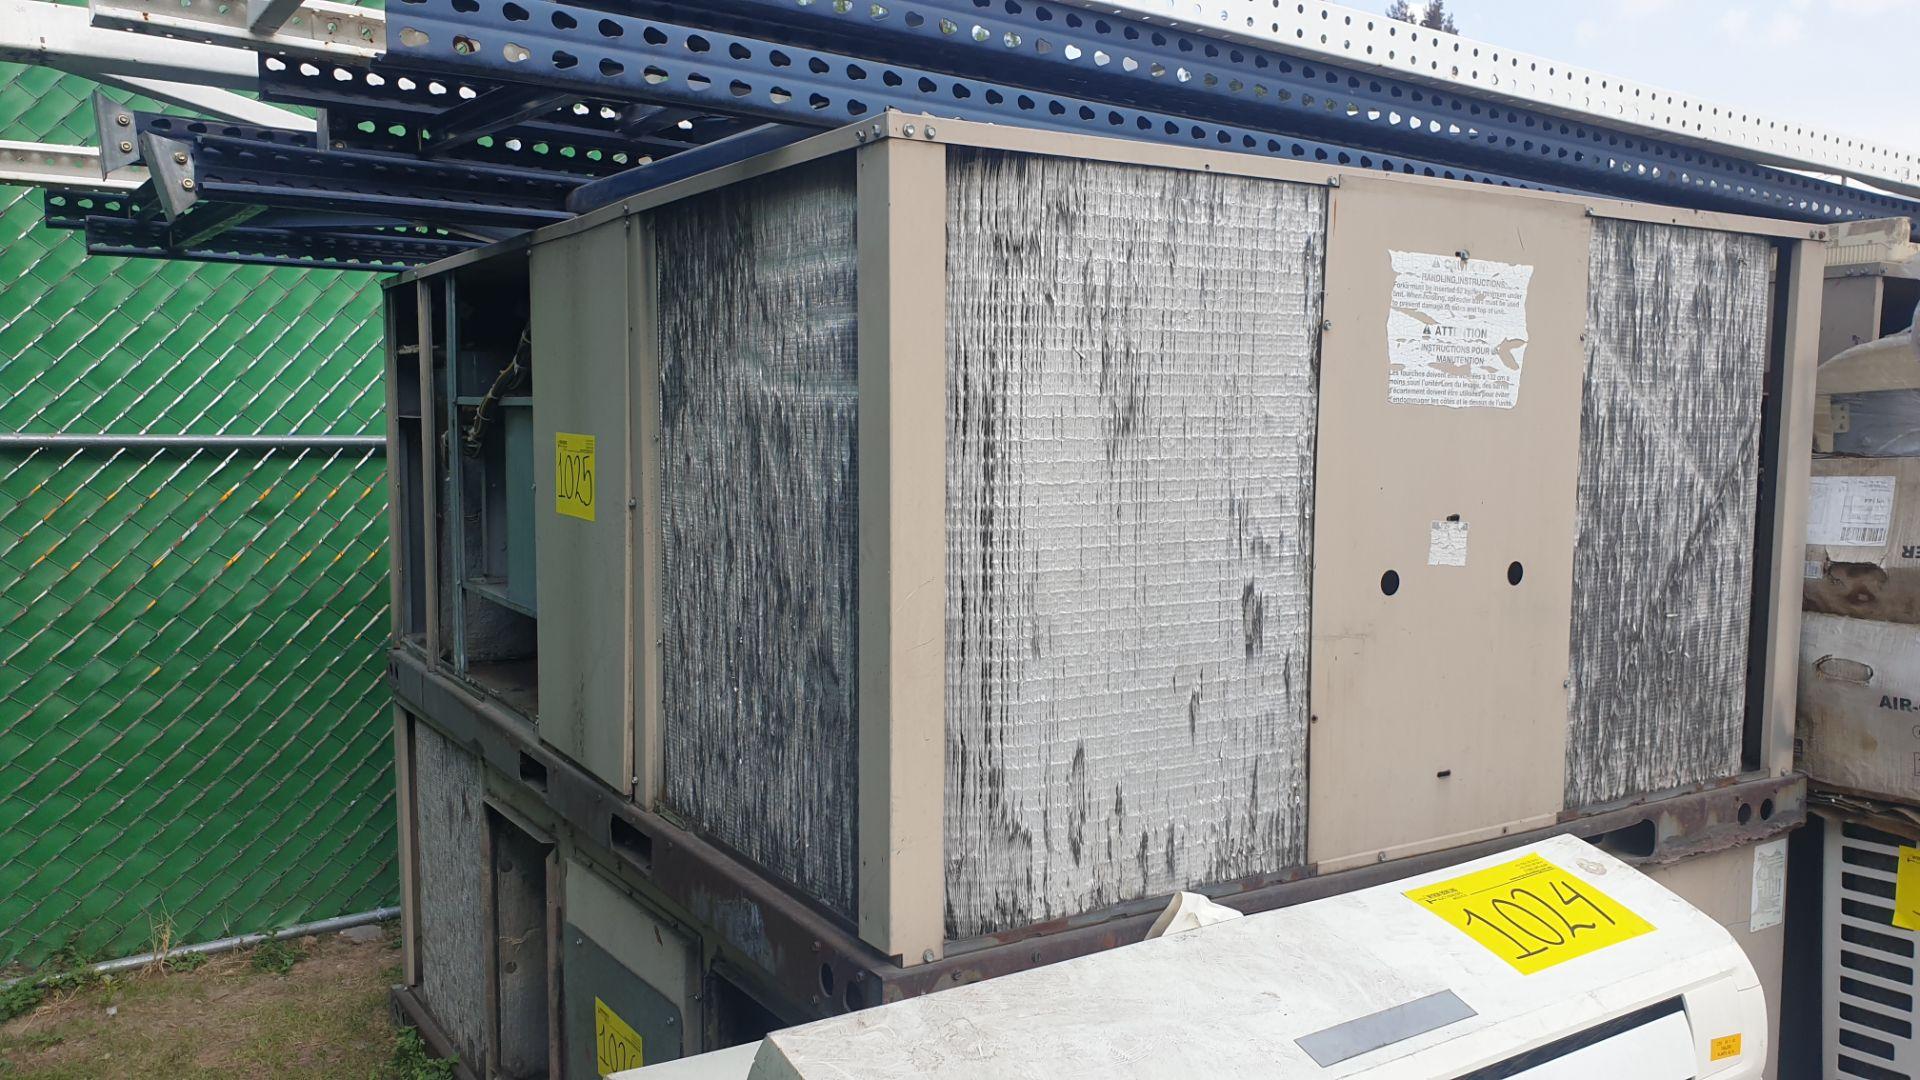 1 York Industrial Condensing unit, model D3CE090A46C n/s NHEM096475 - Image 3 of 6